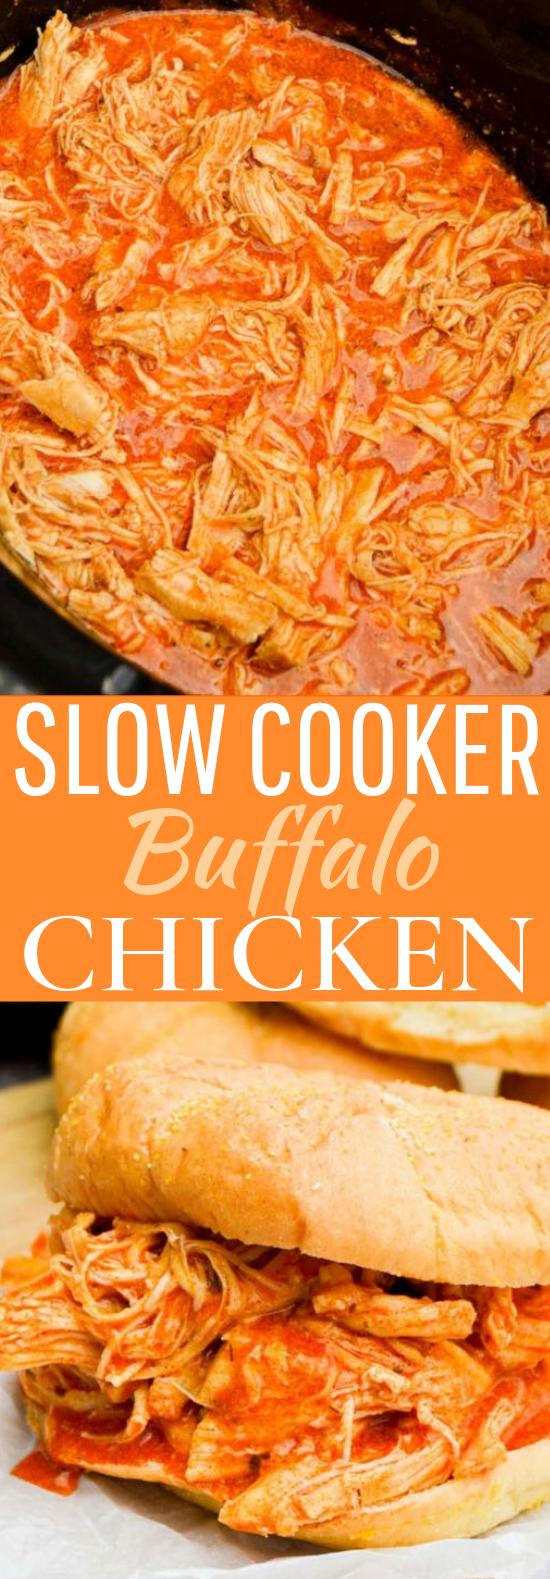 Slow Cooker Shredded Buffalo Chicken Sandwich #dinner #slowcooker